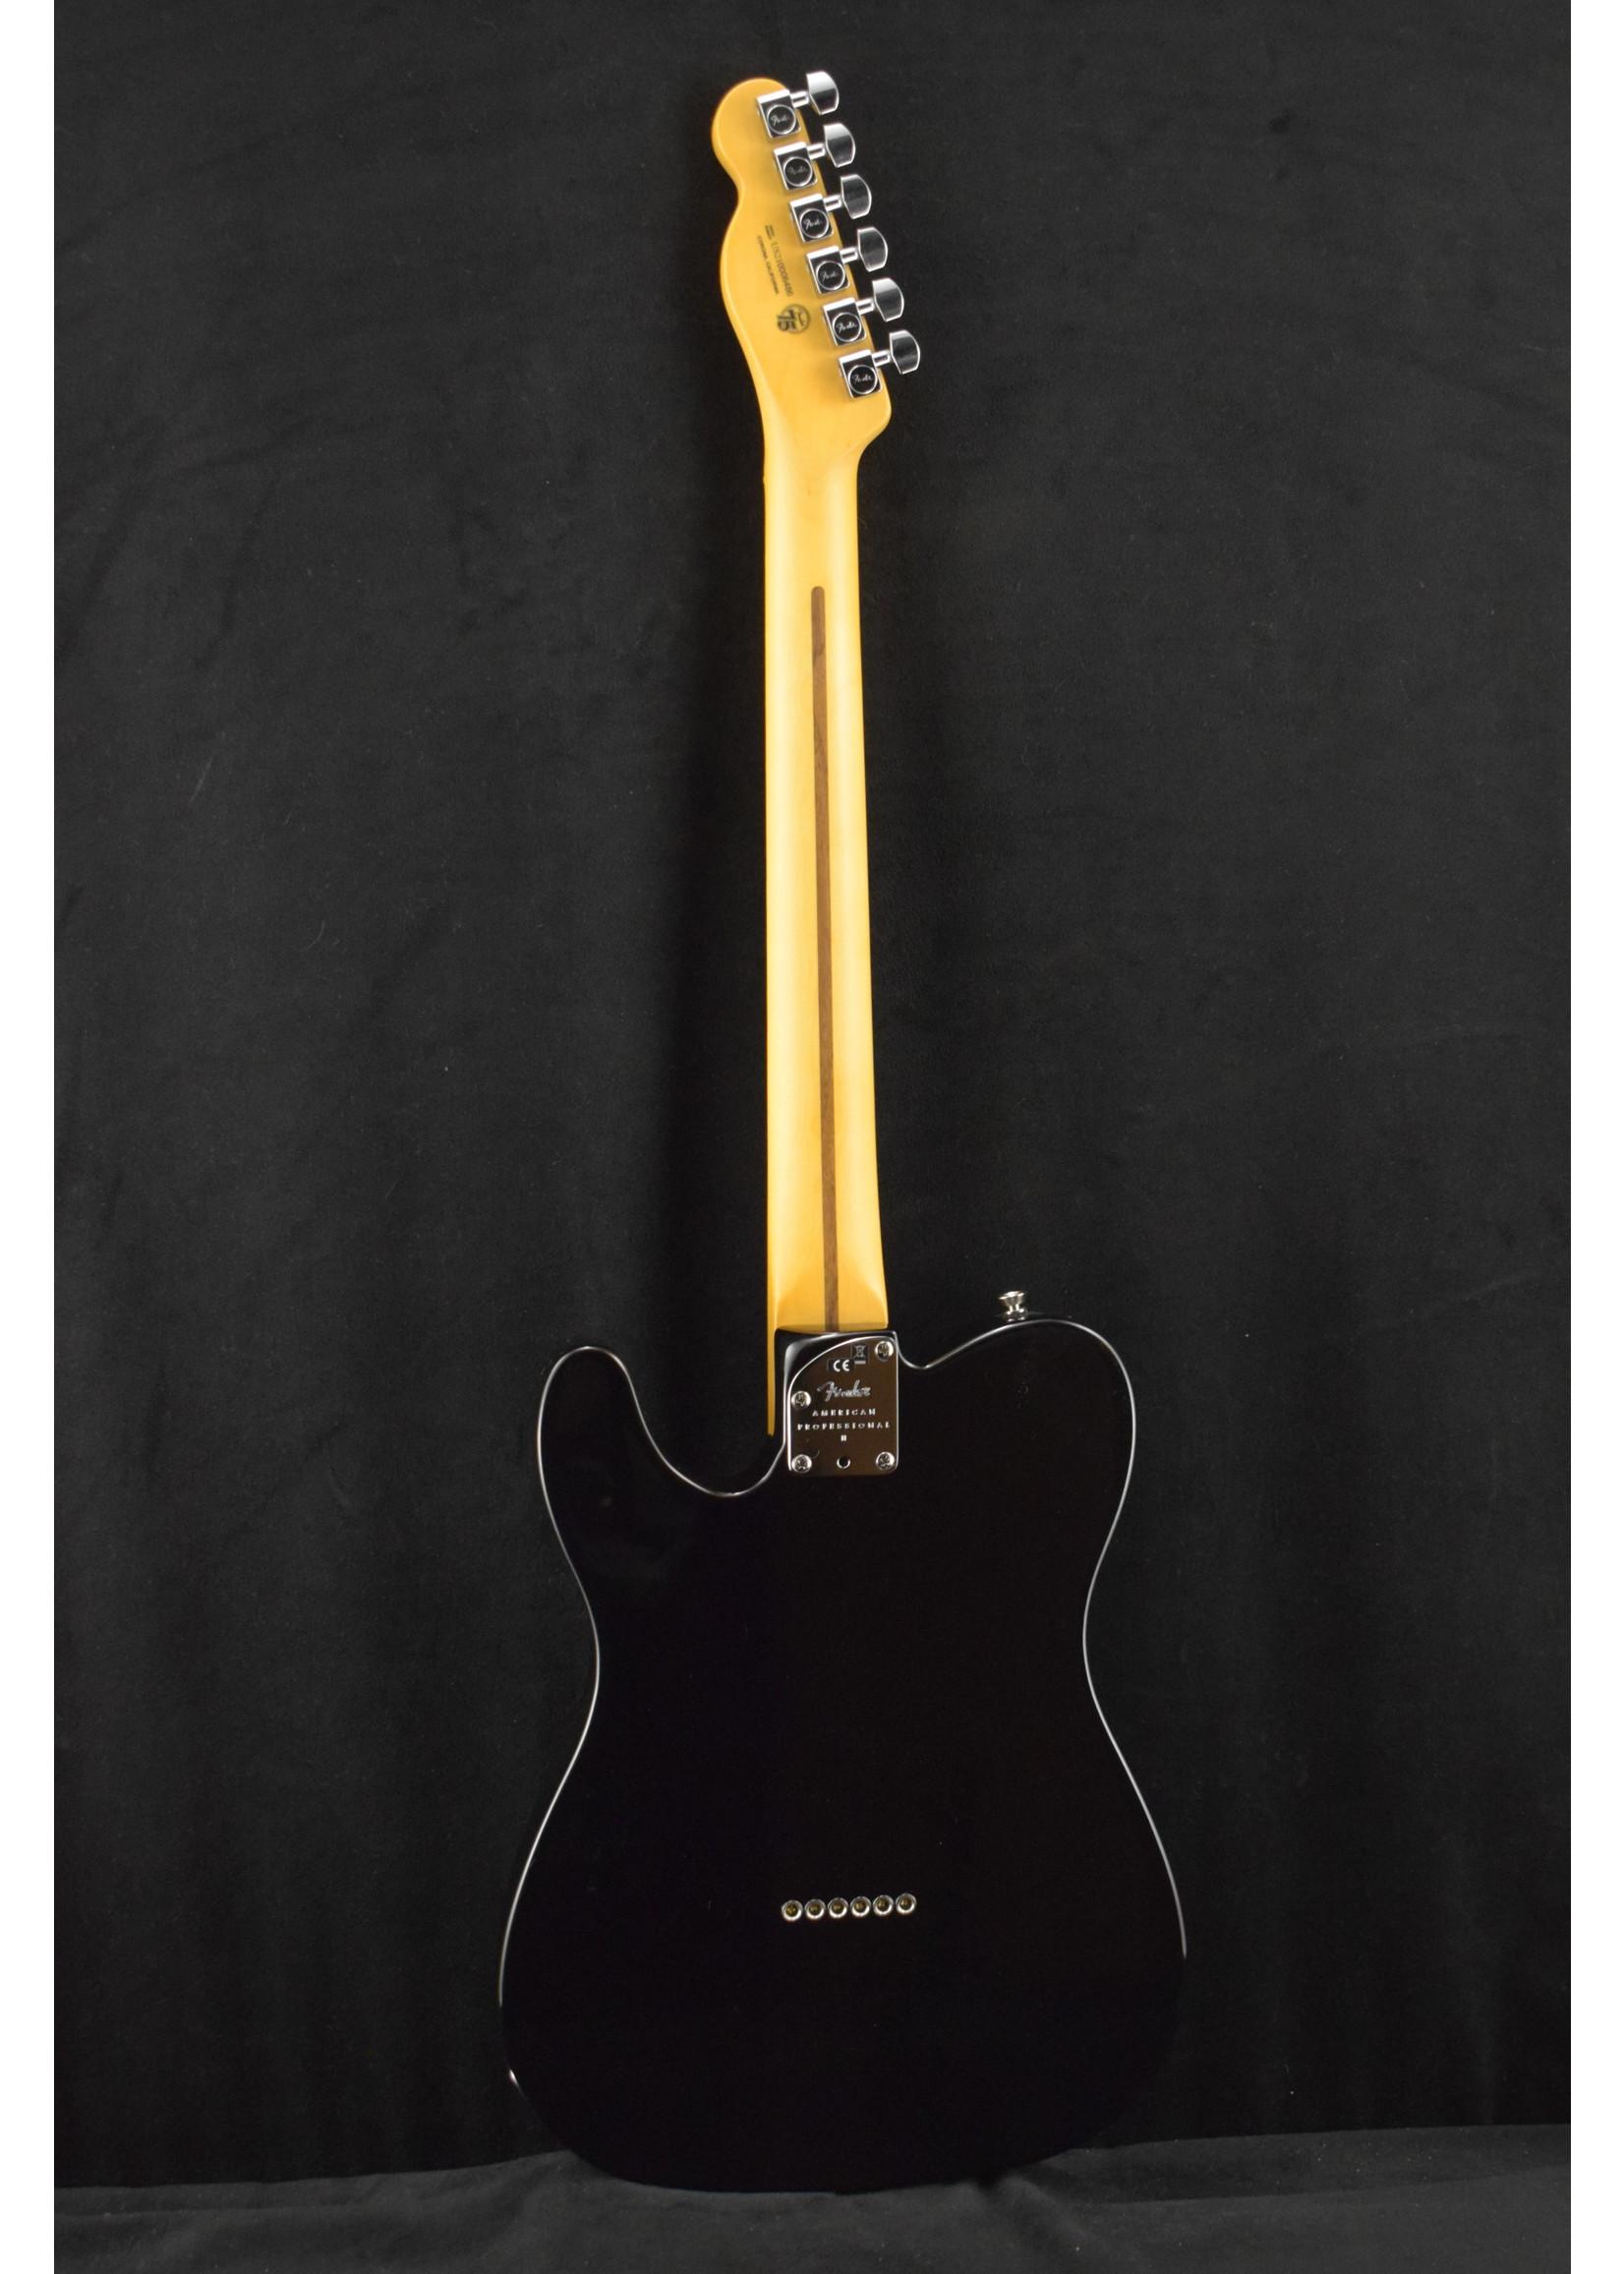 Fender Fender American Professional II Telecaster Black Maple Fretboard